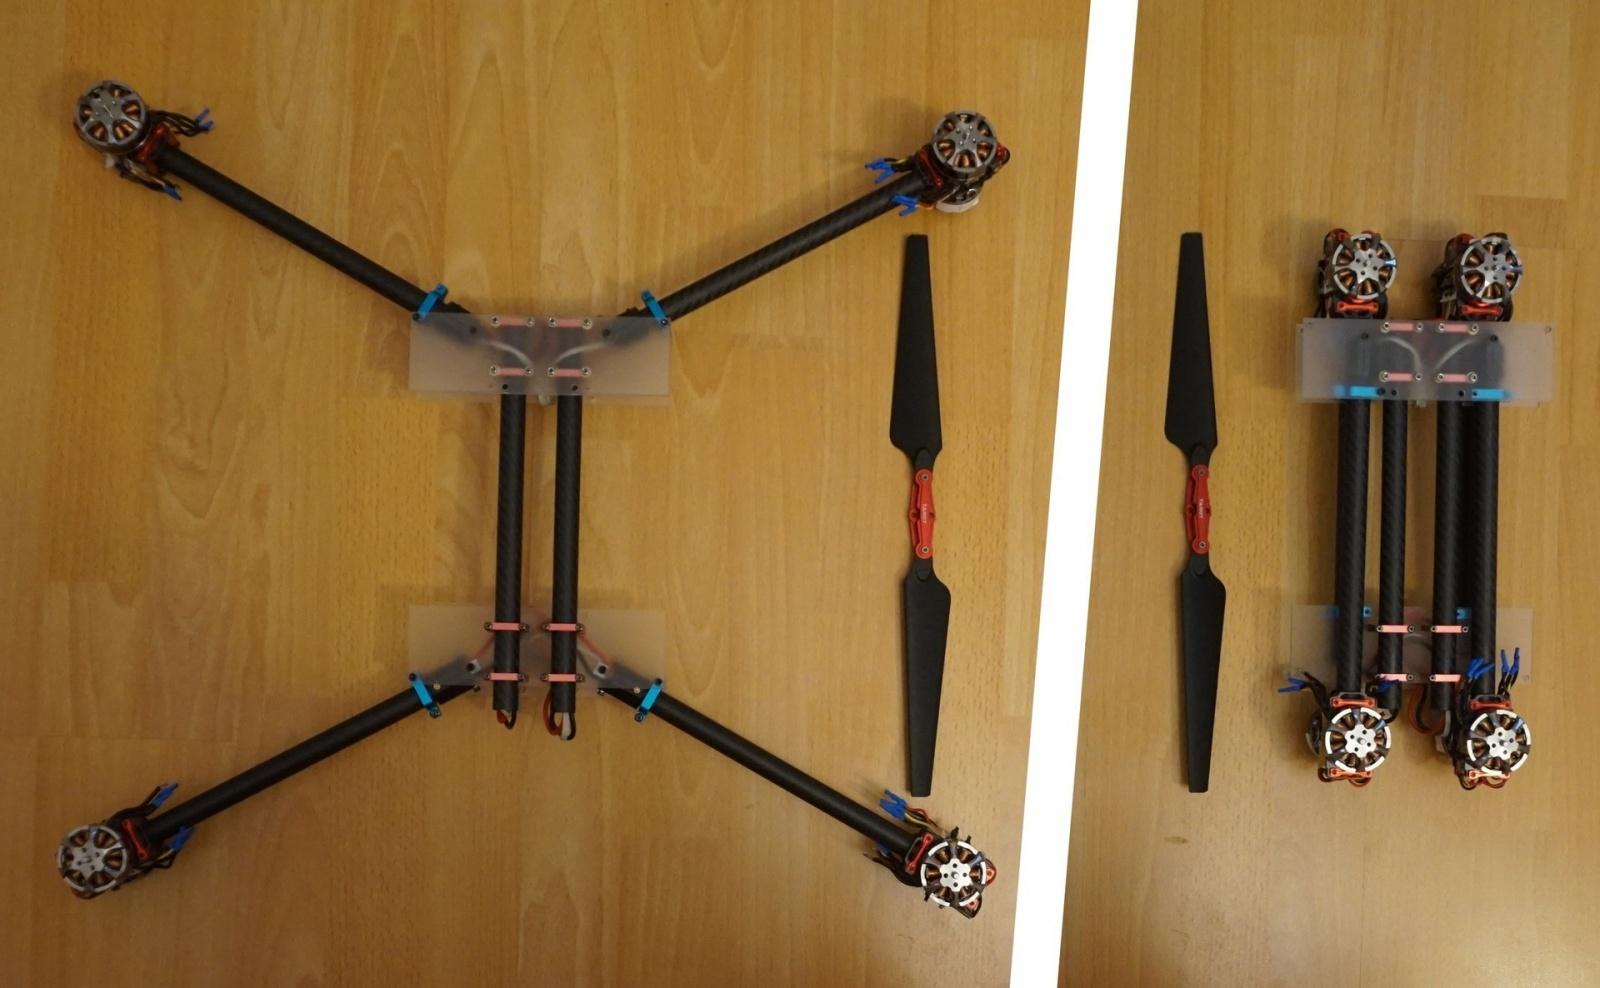 Коптер в рюкзаке (часть 2) — Лего для дронов - 2